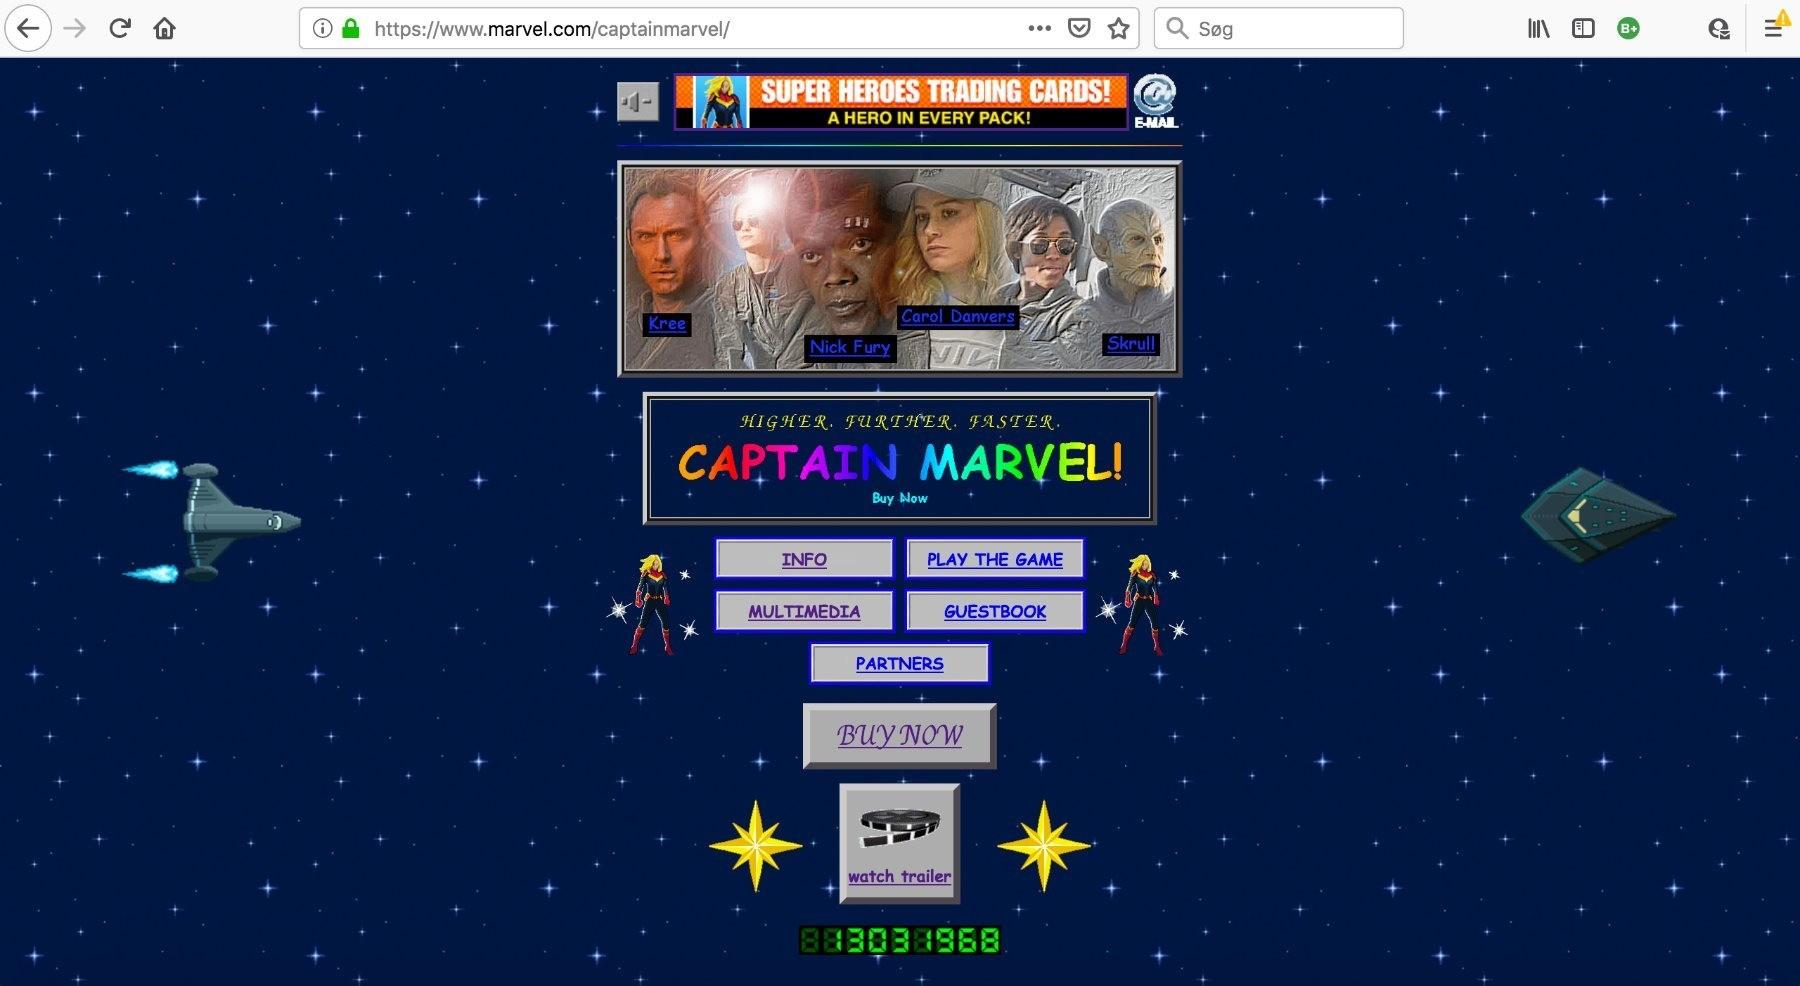 Screendump af Captain Marvel filmens mikrosite